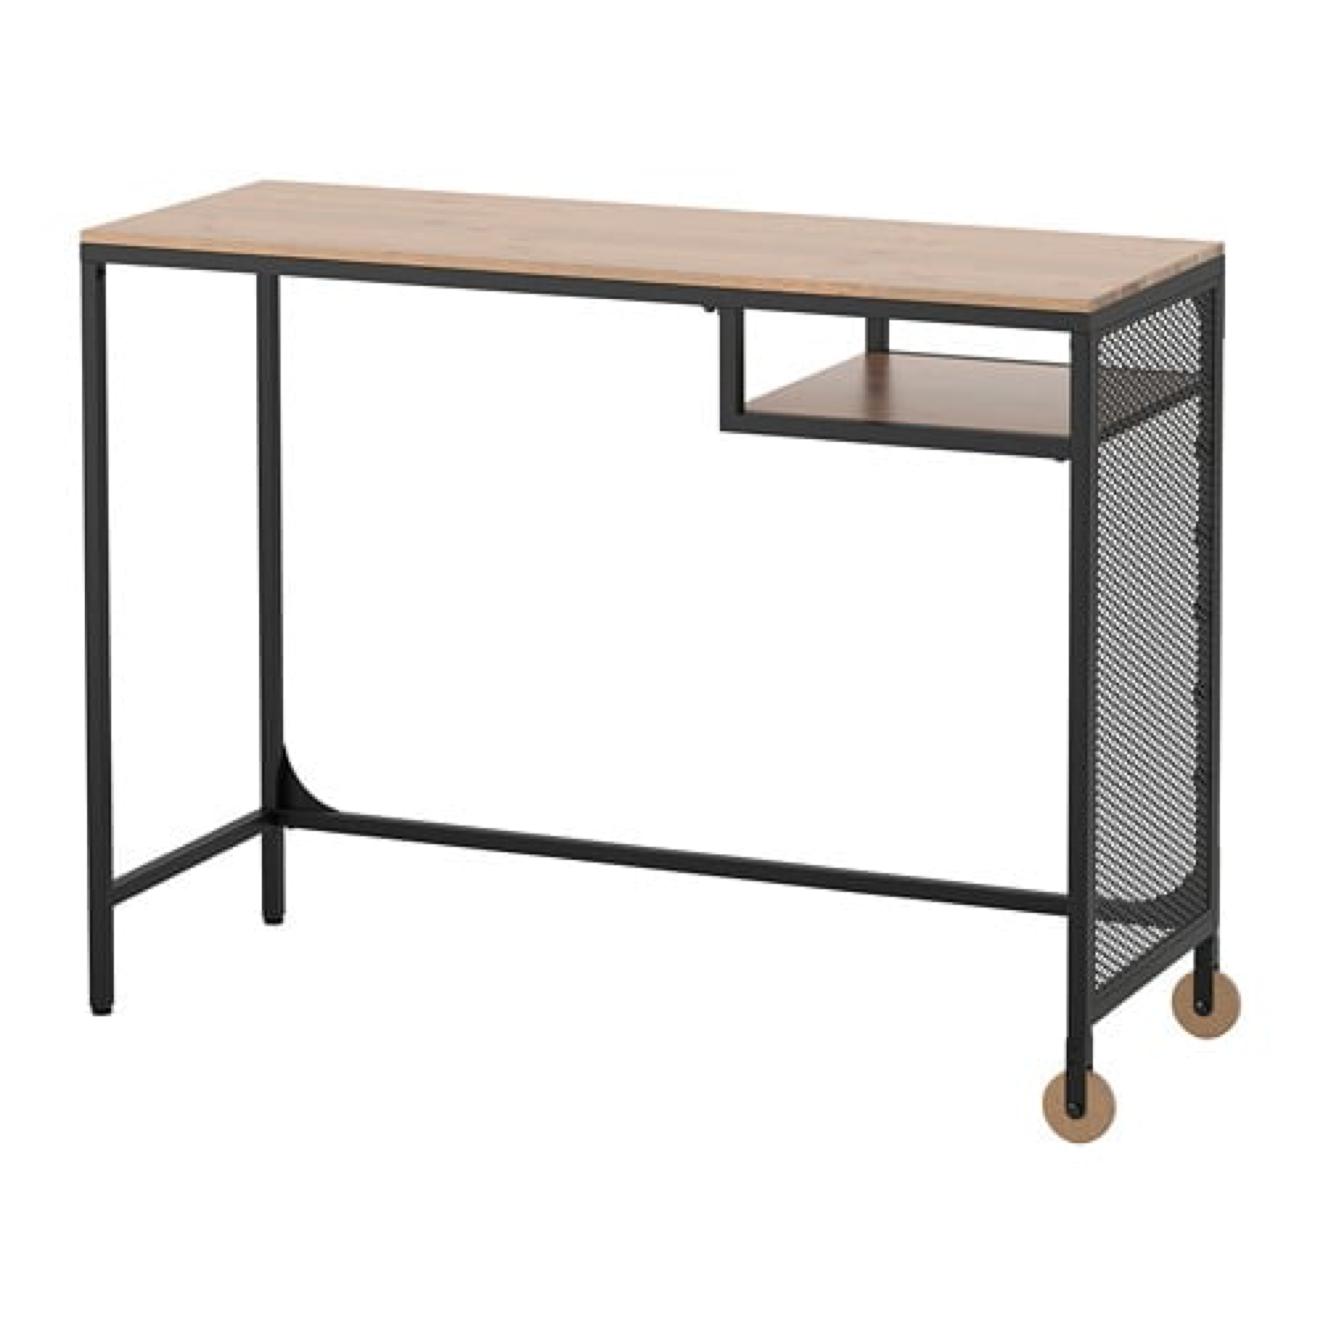 Ikea Fjallbo Desk Computer Laptop Table Black Rustic Metal Design